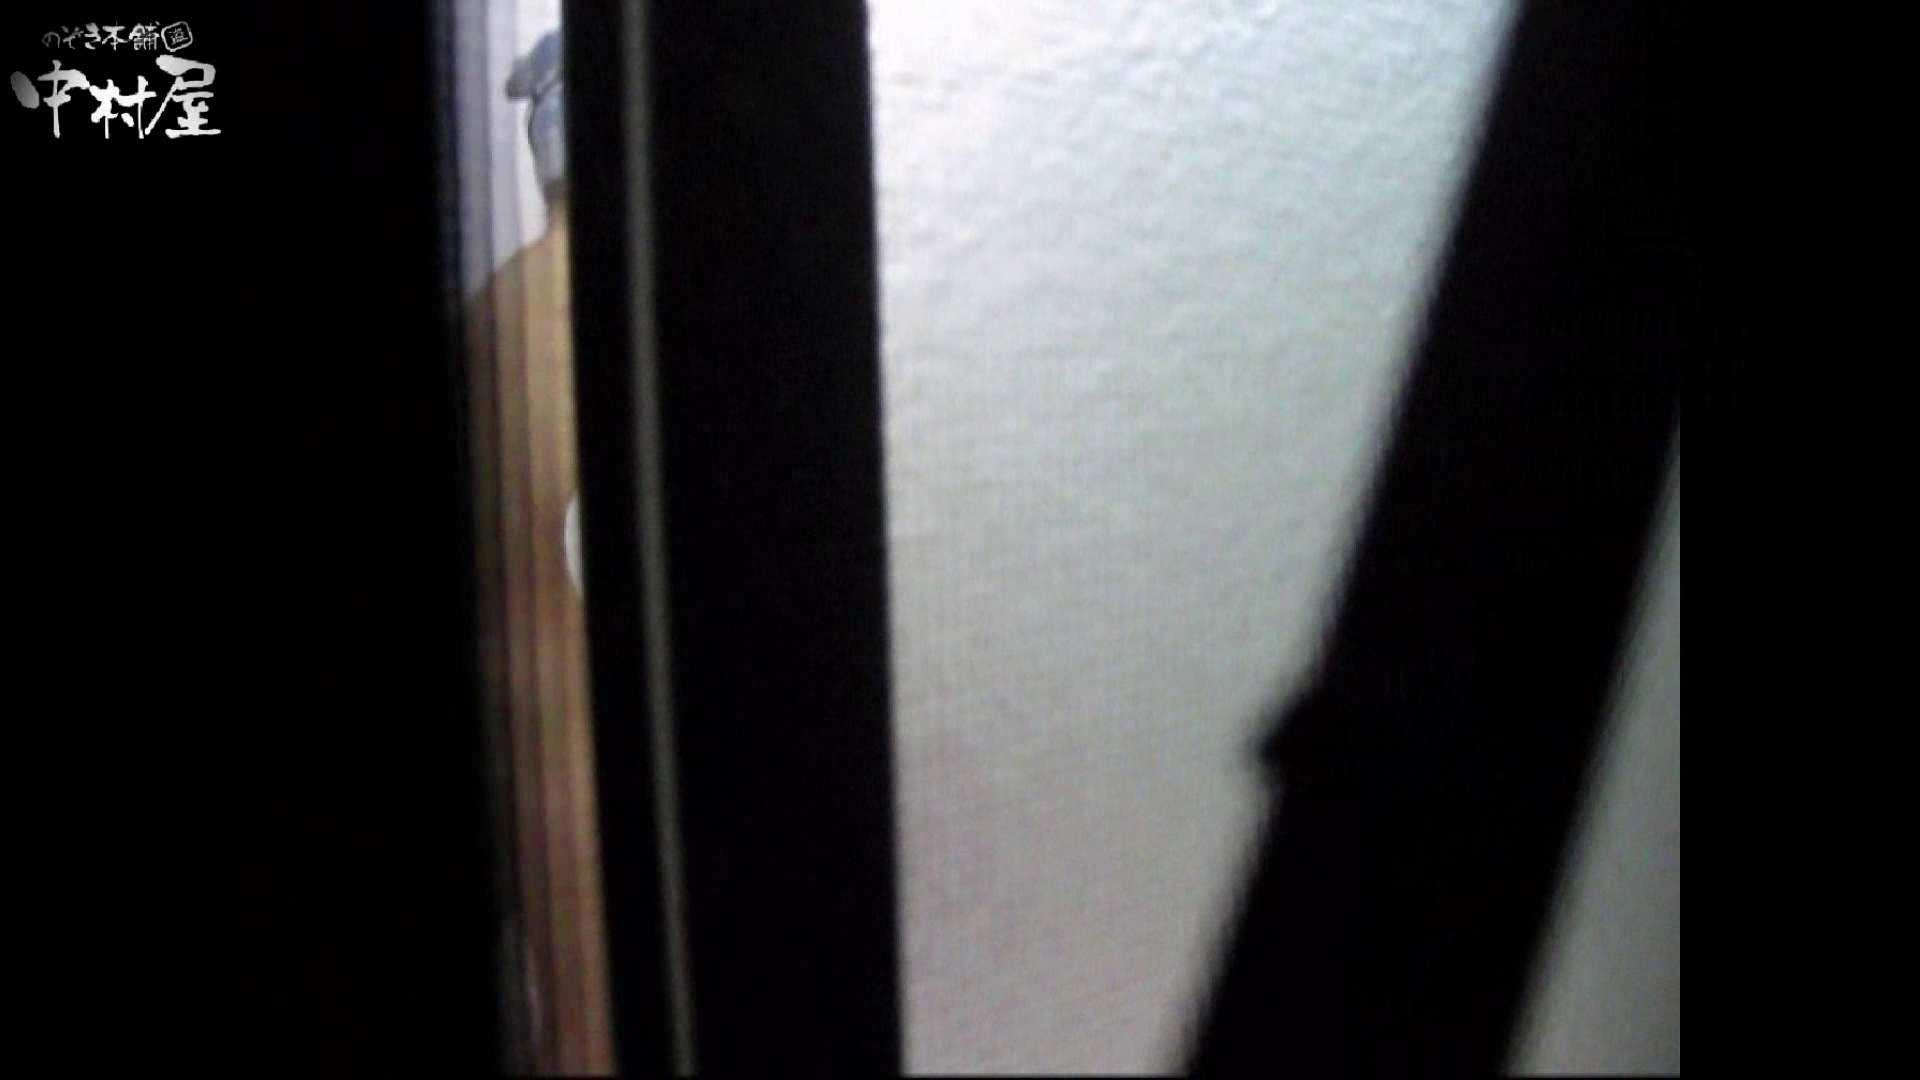 民家風呂専門盗撮師の超危険映像 vol.002 盗撮大放出 おめこ無修正動画無料 66連発 38